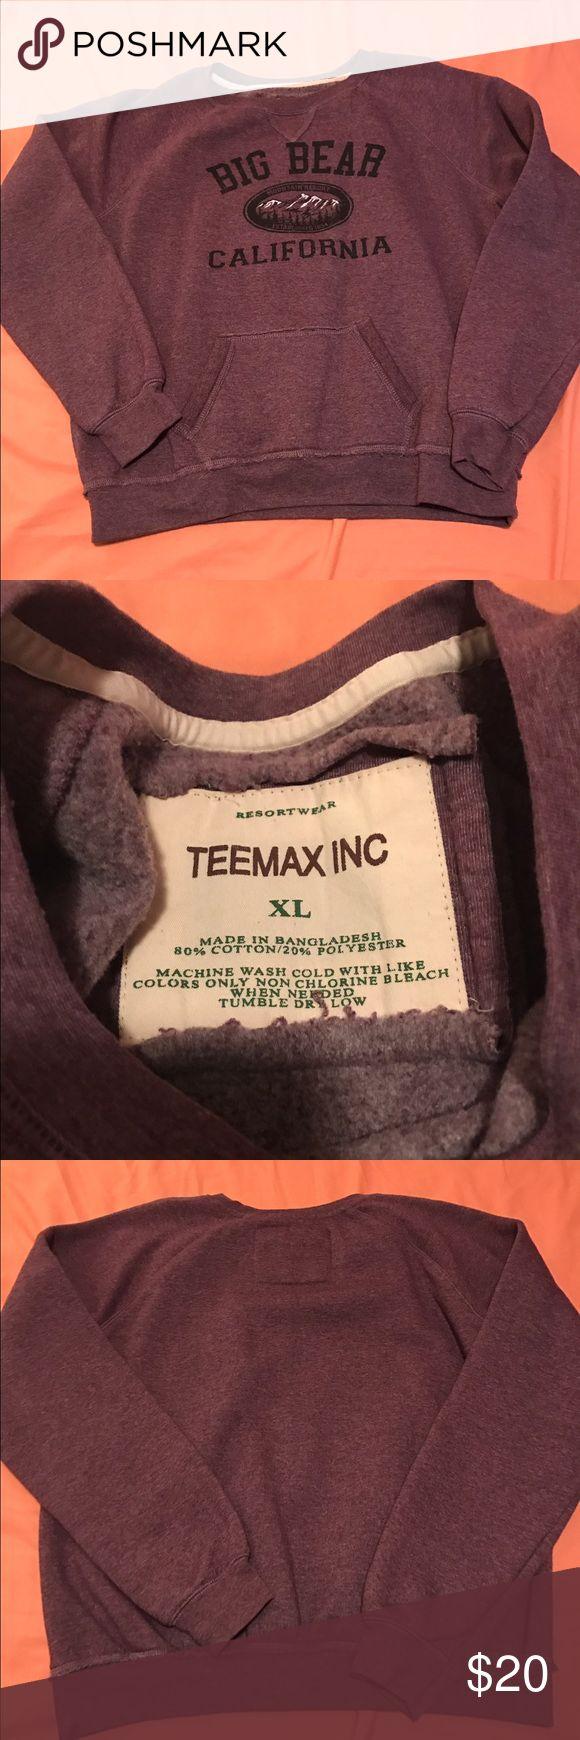 Teemax, INC. Big Bear, California crew sweater Teemax, INC. Big Bear, California crew sweater, women's XL teemax Sweaters Crew & Scoop Necks